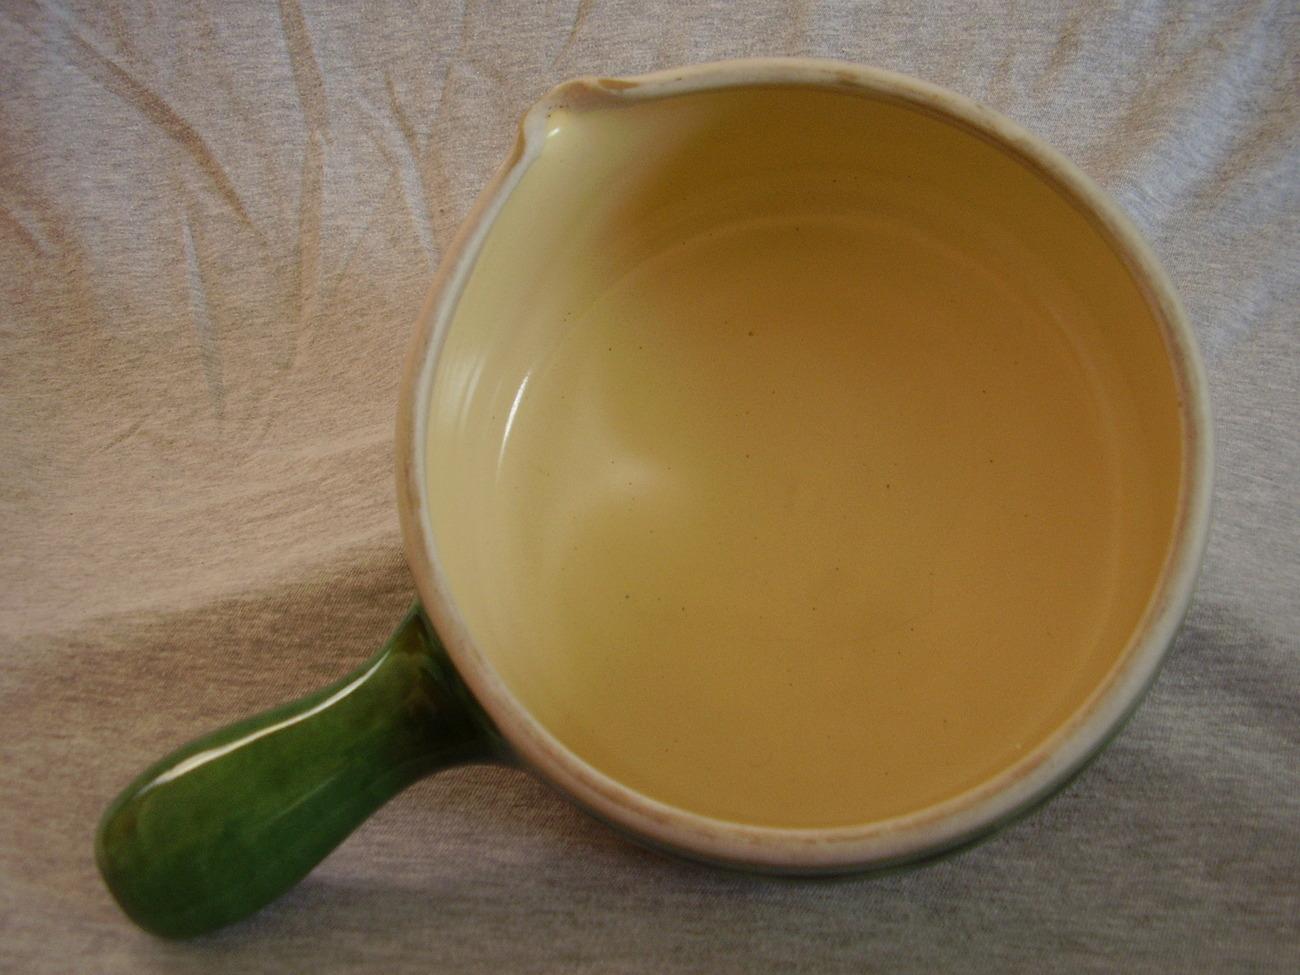 Vintage Denby Stoneware Sauce Tureen Epic